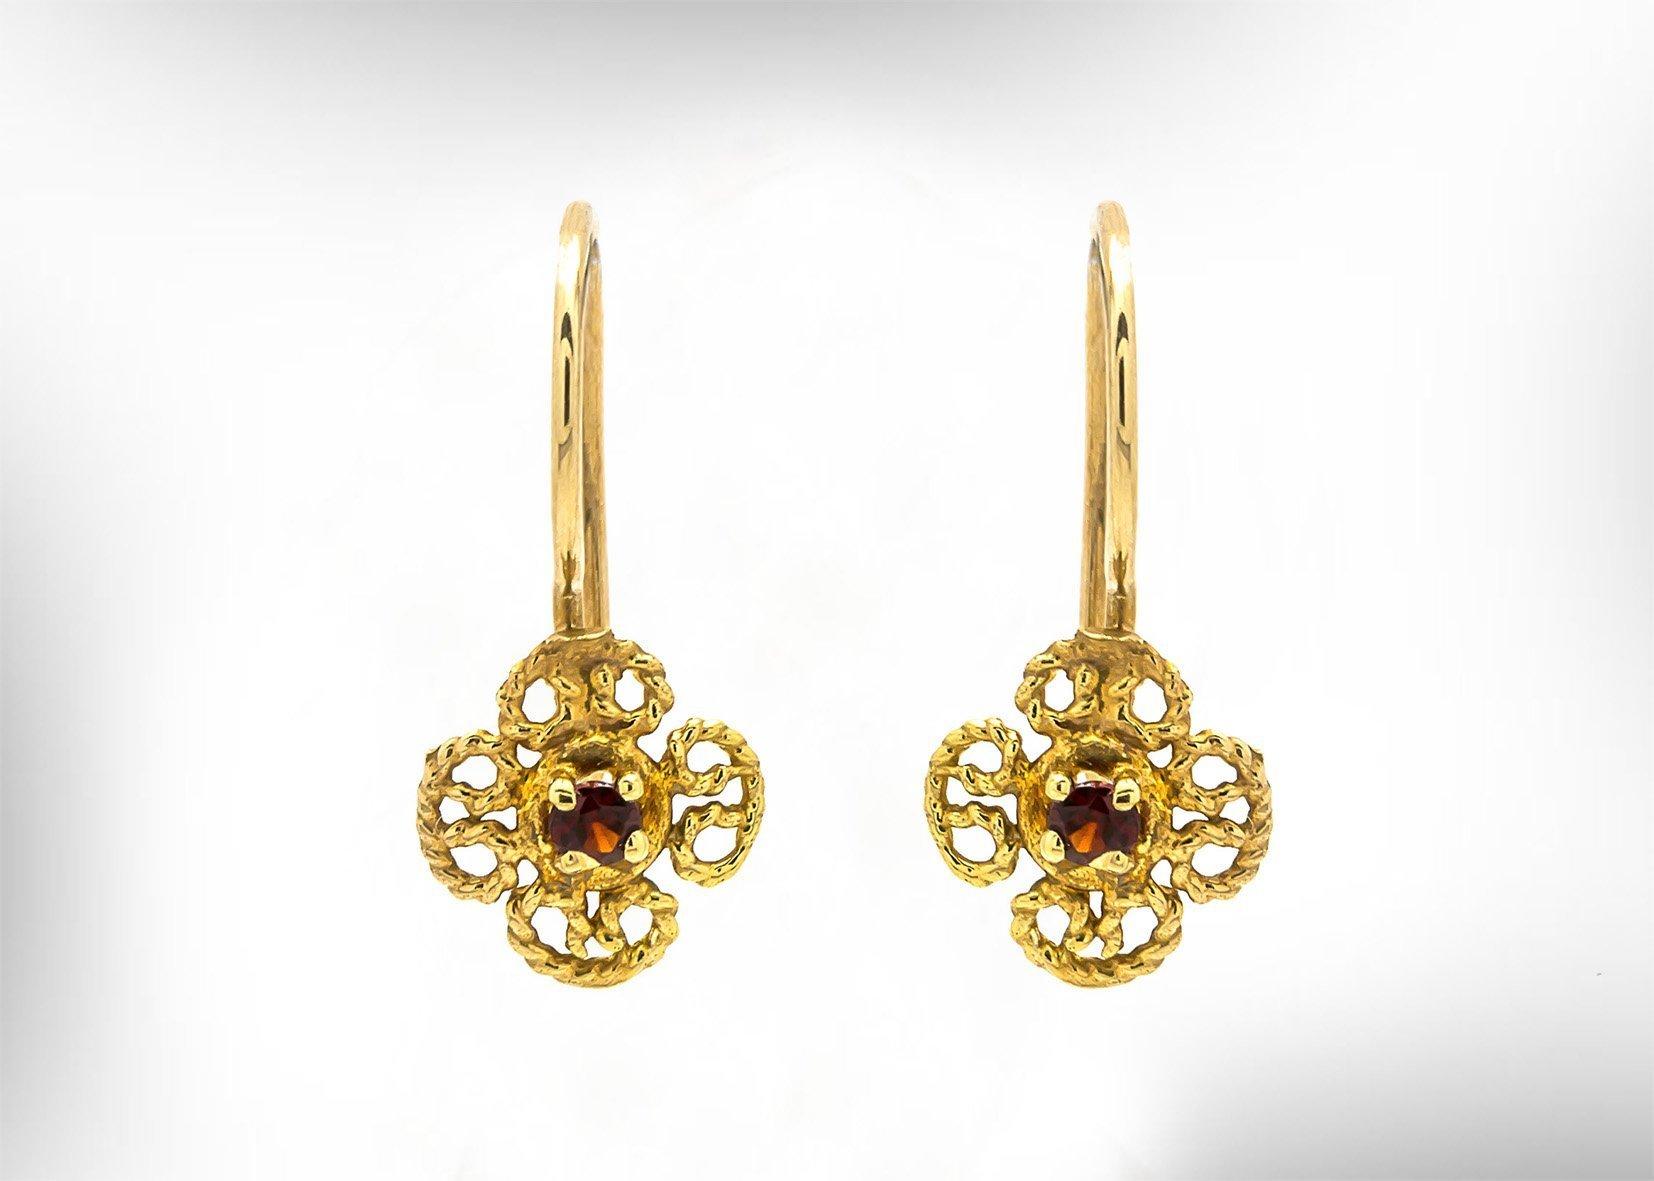 Handmade Women Earrings,9k or 14k Gold with Garnet Gemstones,.January Birthstones, Vintage Lace Earrings for Her. Customized Gemstones and Material.